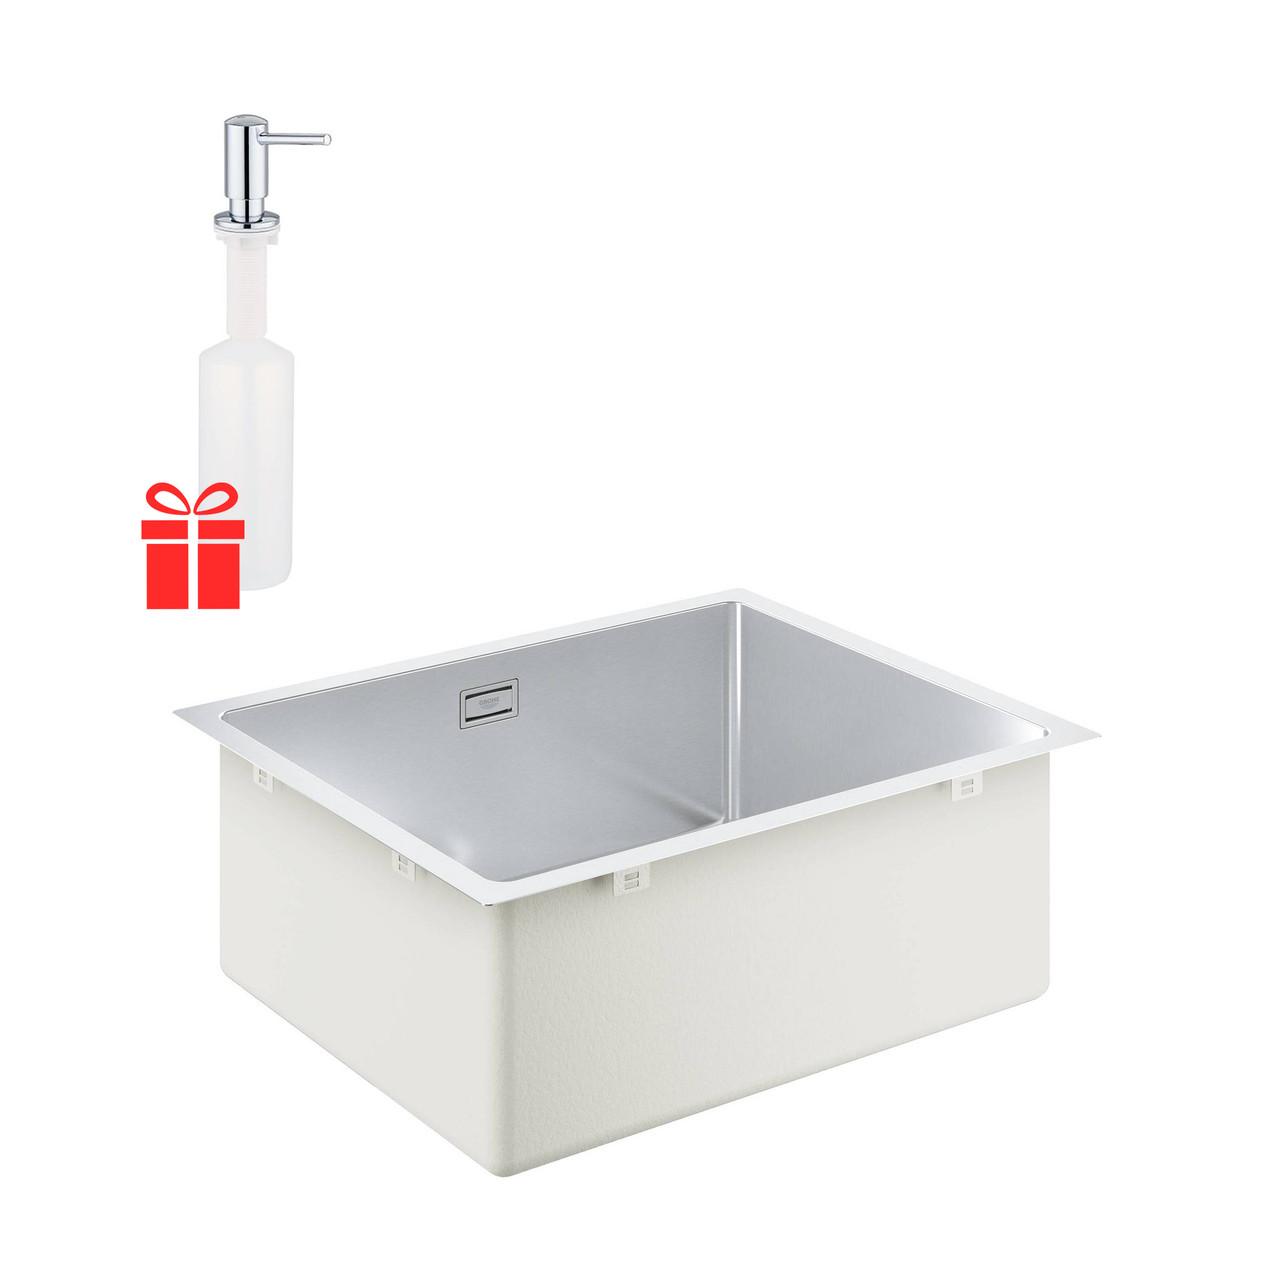 Набір Grohe мийка кухонна K700U 31574SD1 + дозатор для миючого засобу Contemporary 40536000